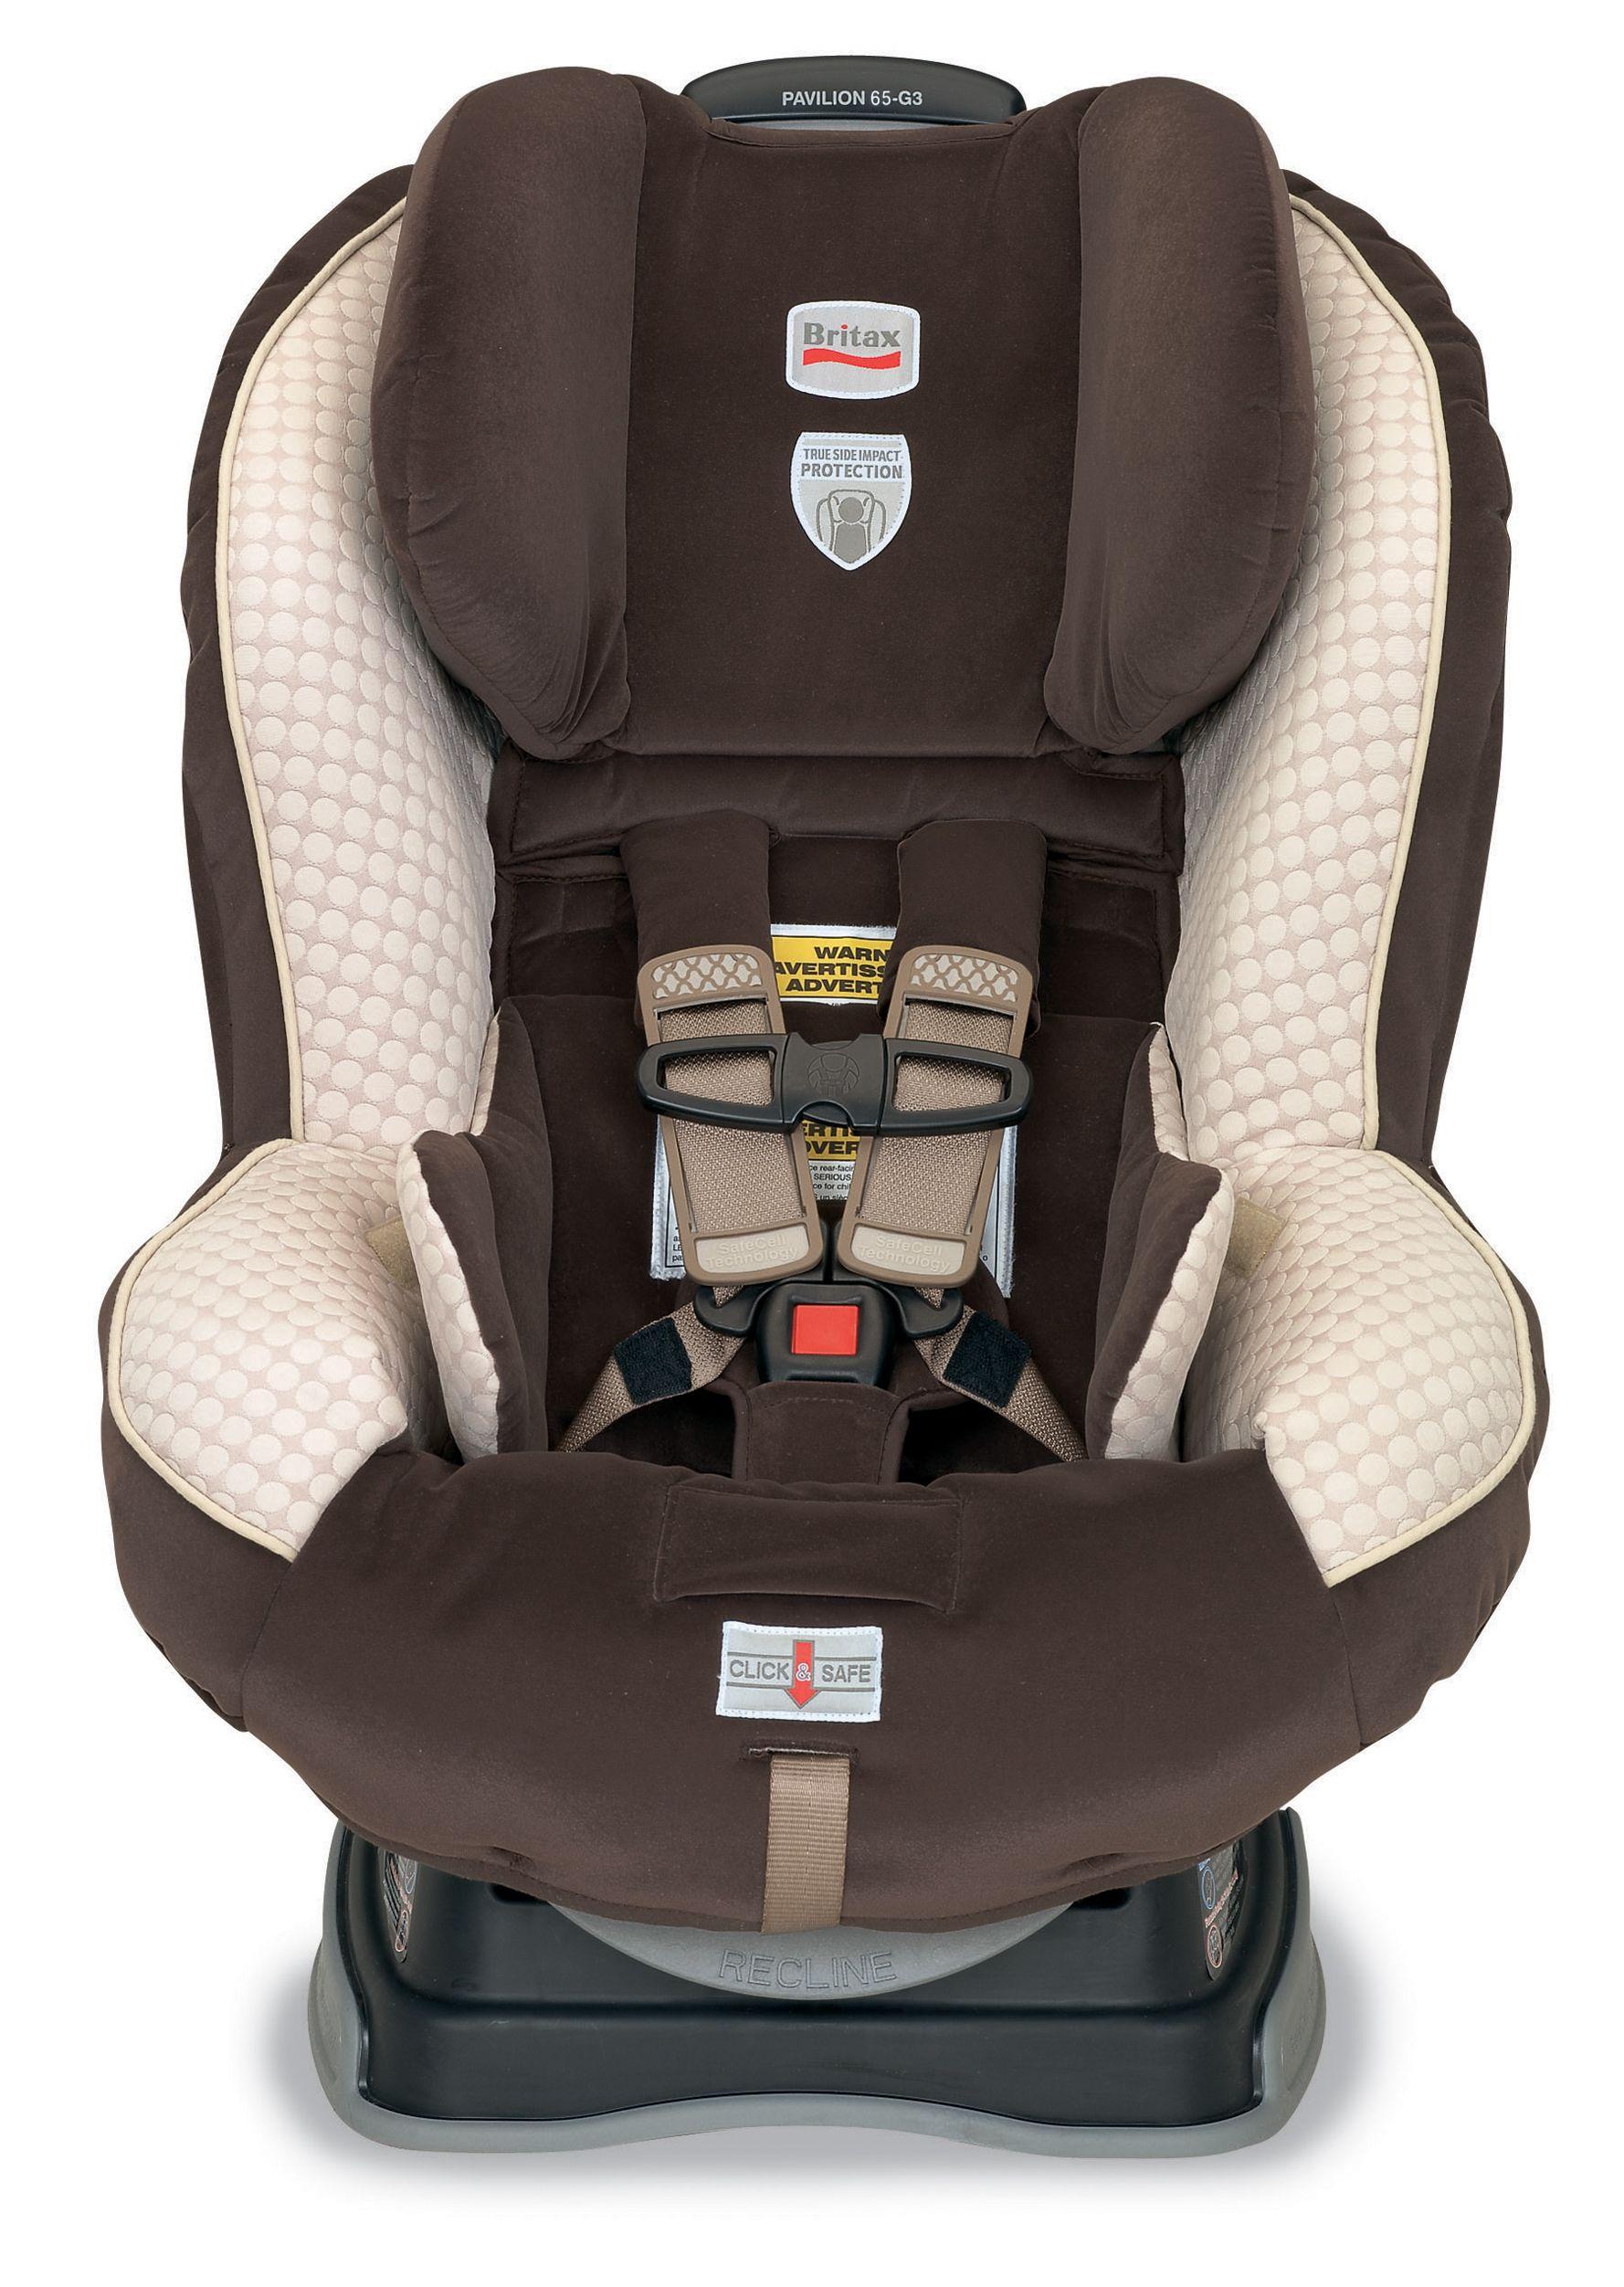 Britax Pavilion 65 Biscotti Car seats, Britax, Baby car